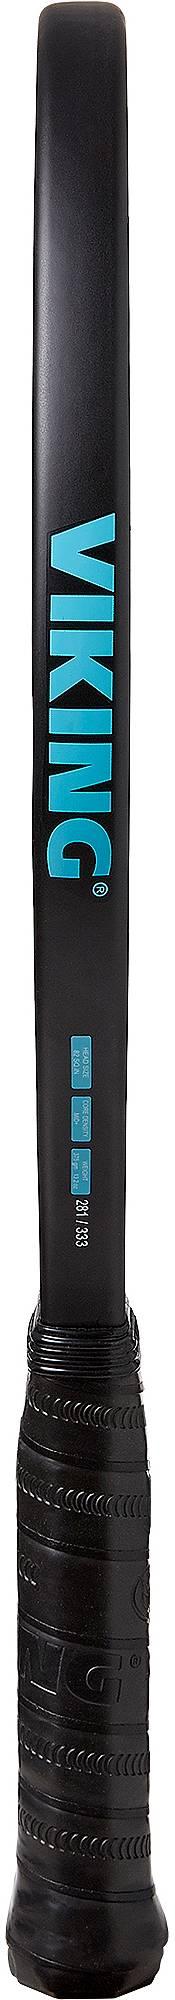 Viking O-Zone Pro Valknut Platform Tennis Paddle - Limited Edition product image